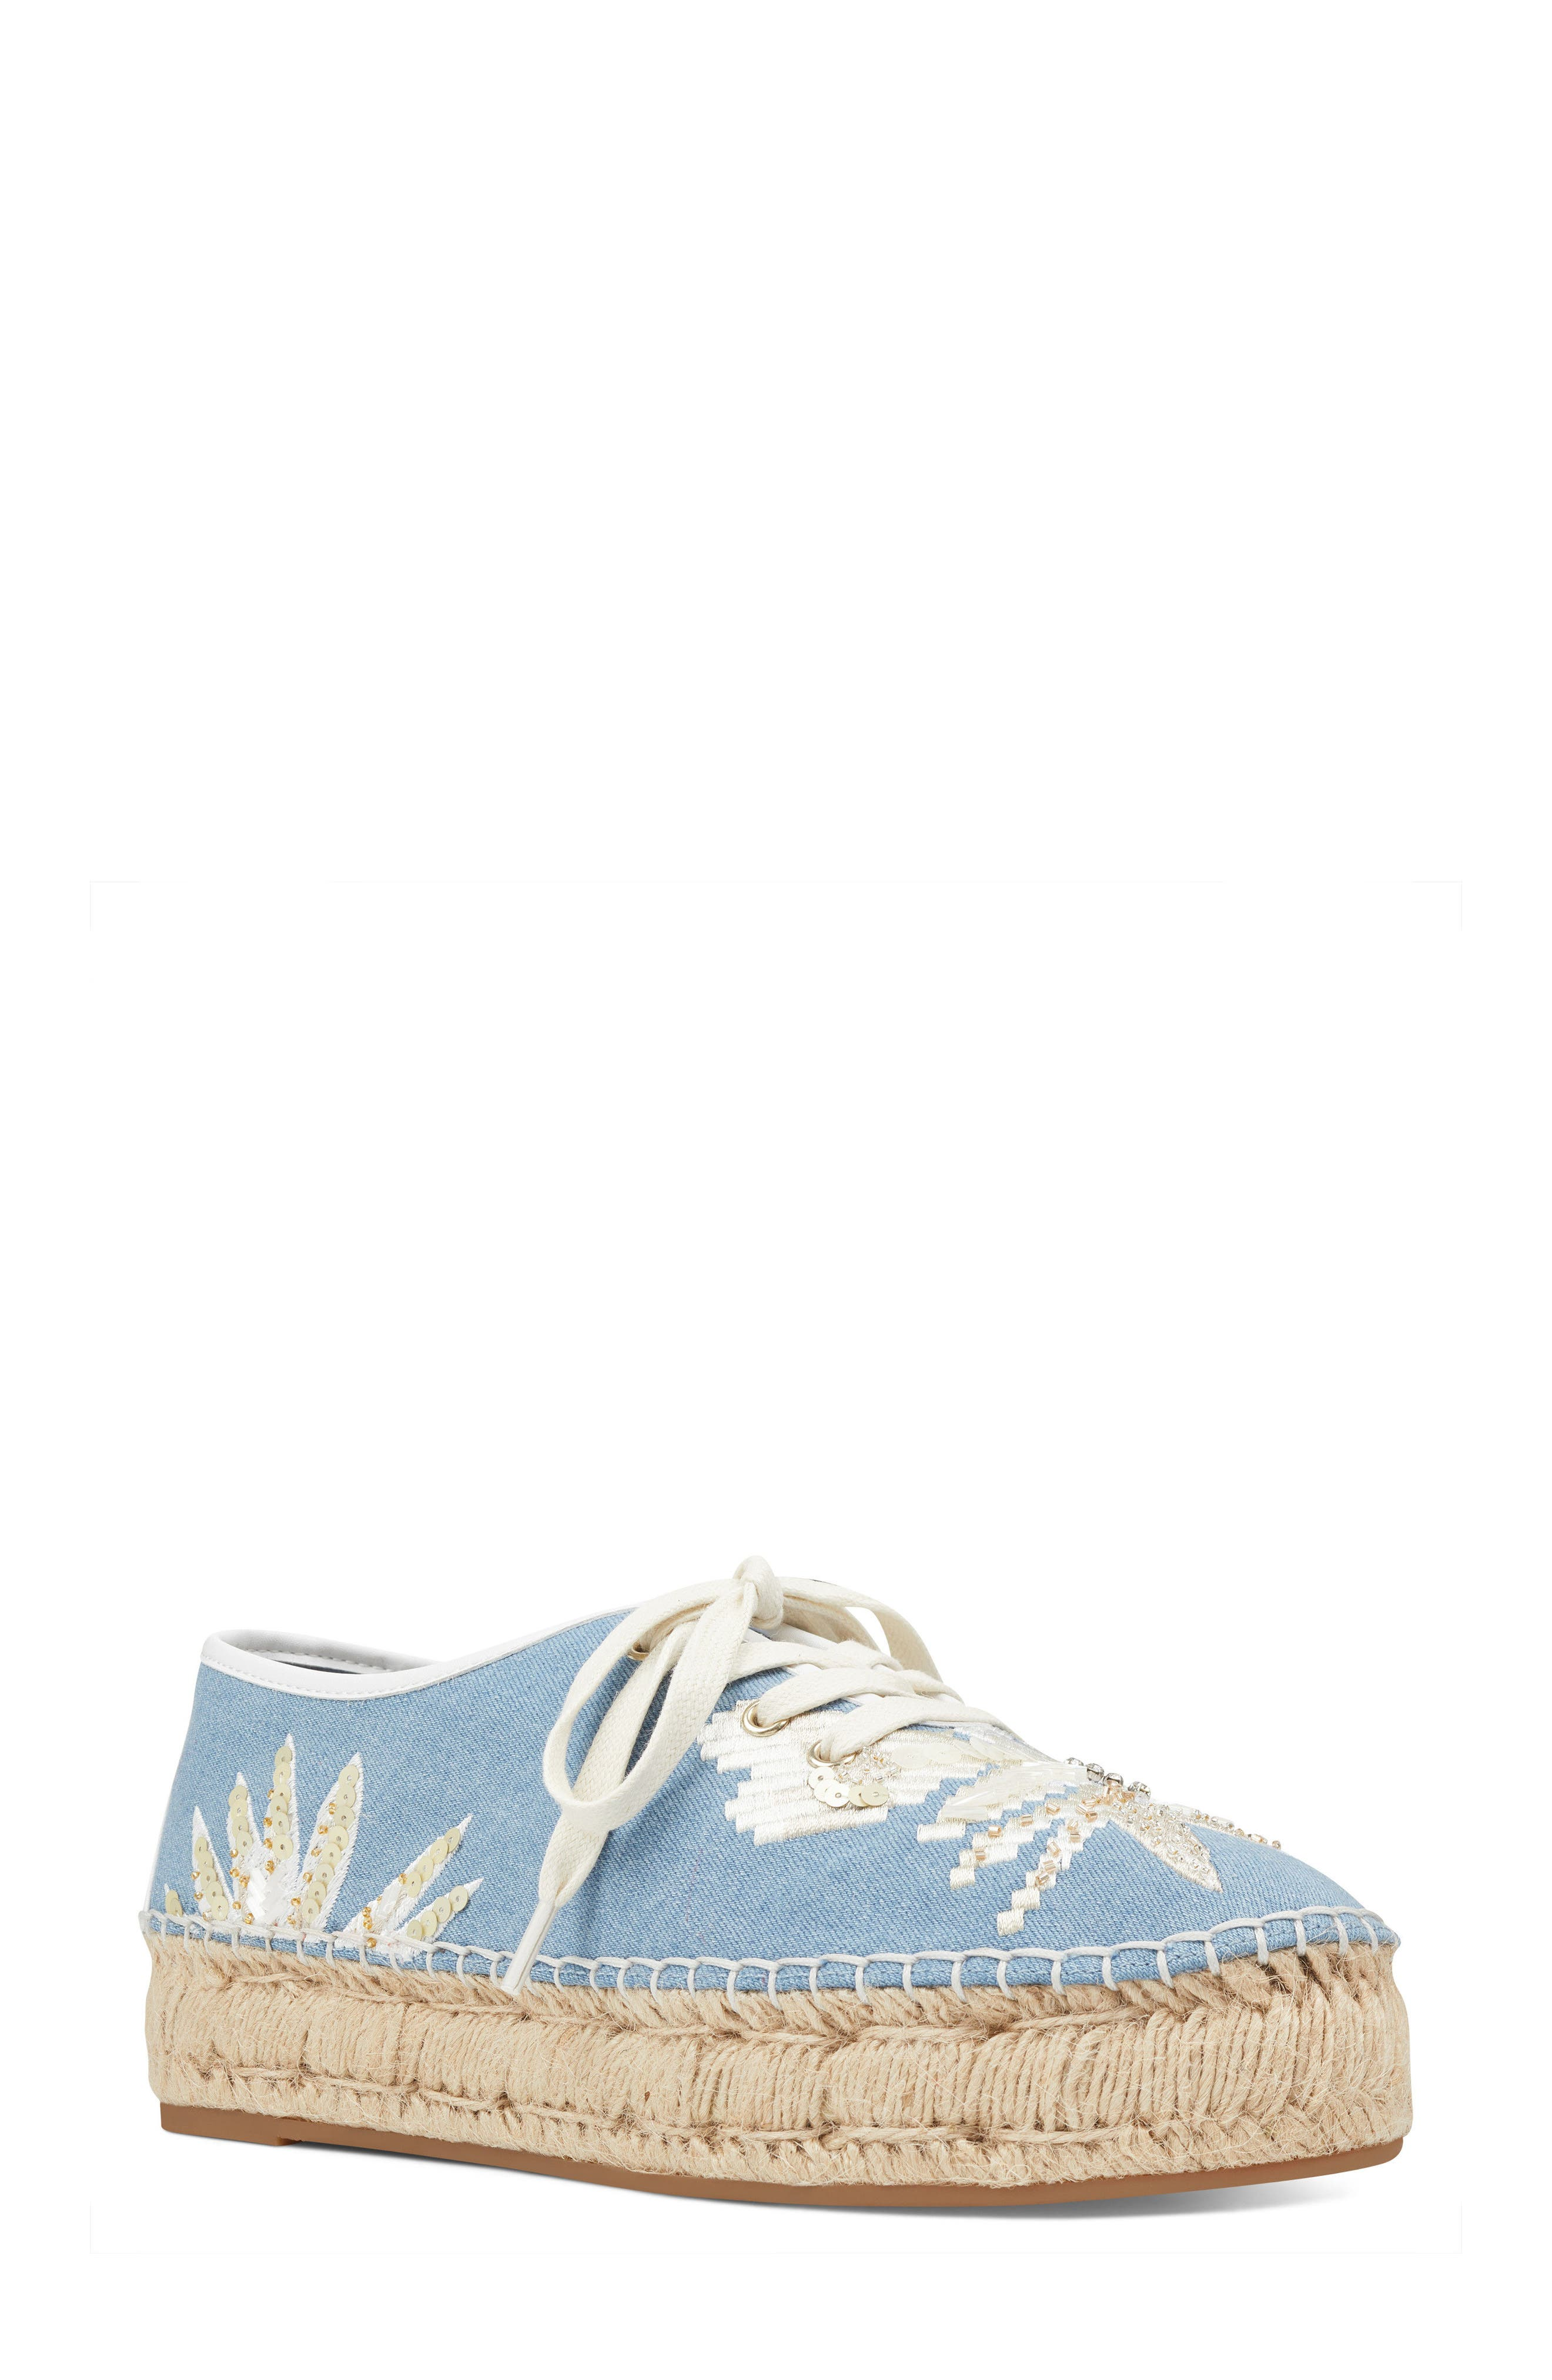 Guinup Embellished Espadrille Sneaker,                             Main thumbnail 1, color,                             Light Blue/ White Denim